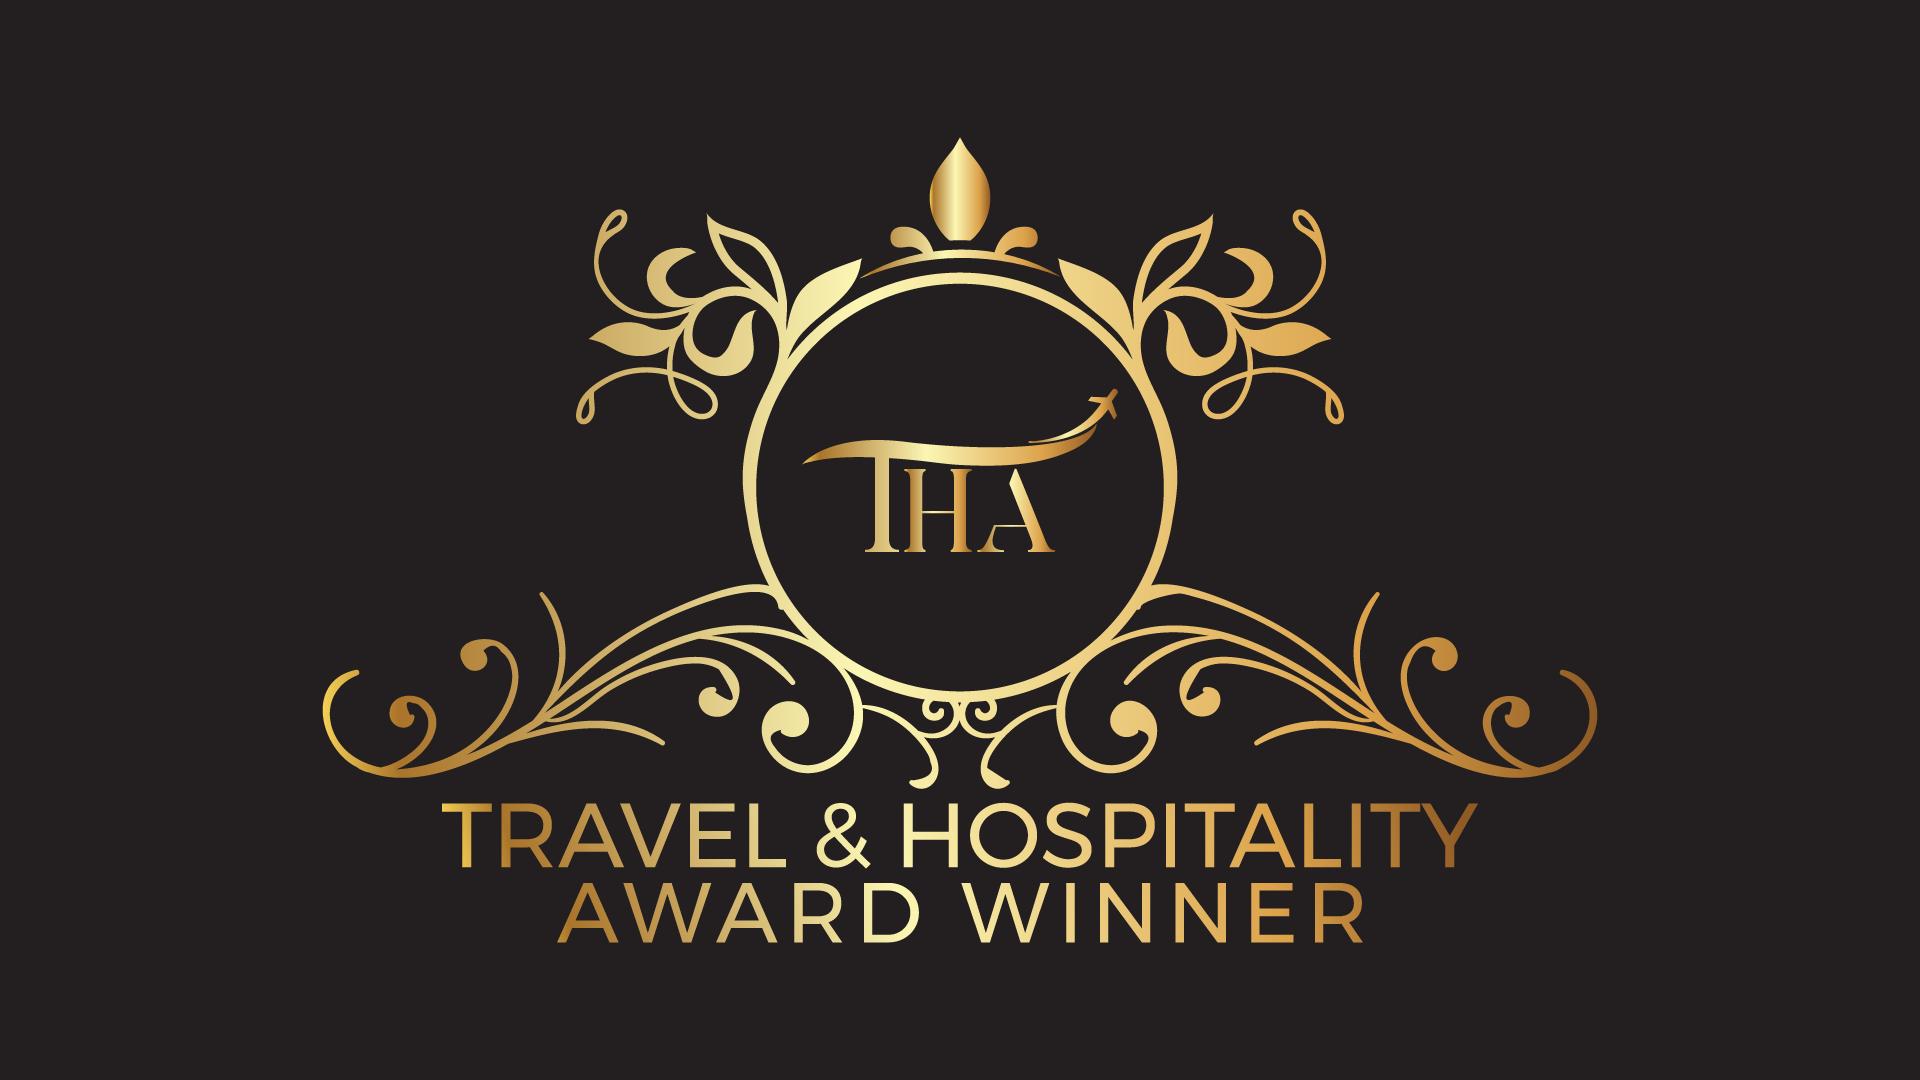 Travel & Hospitality Awards